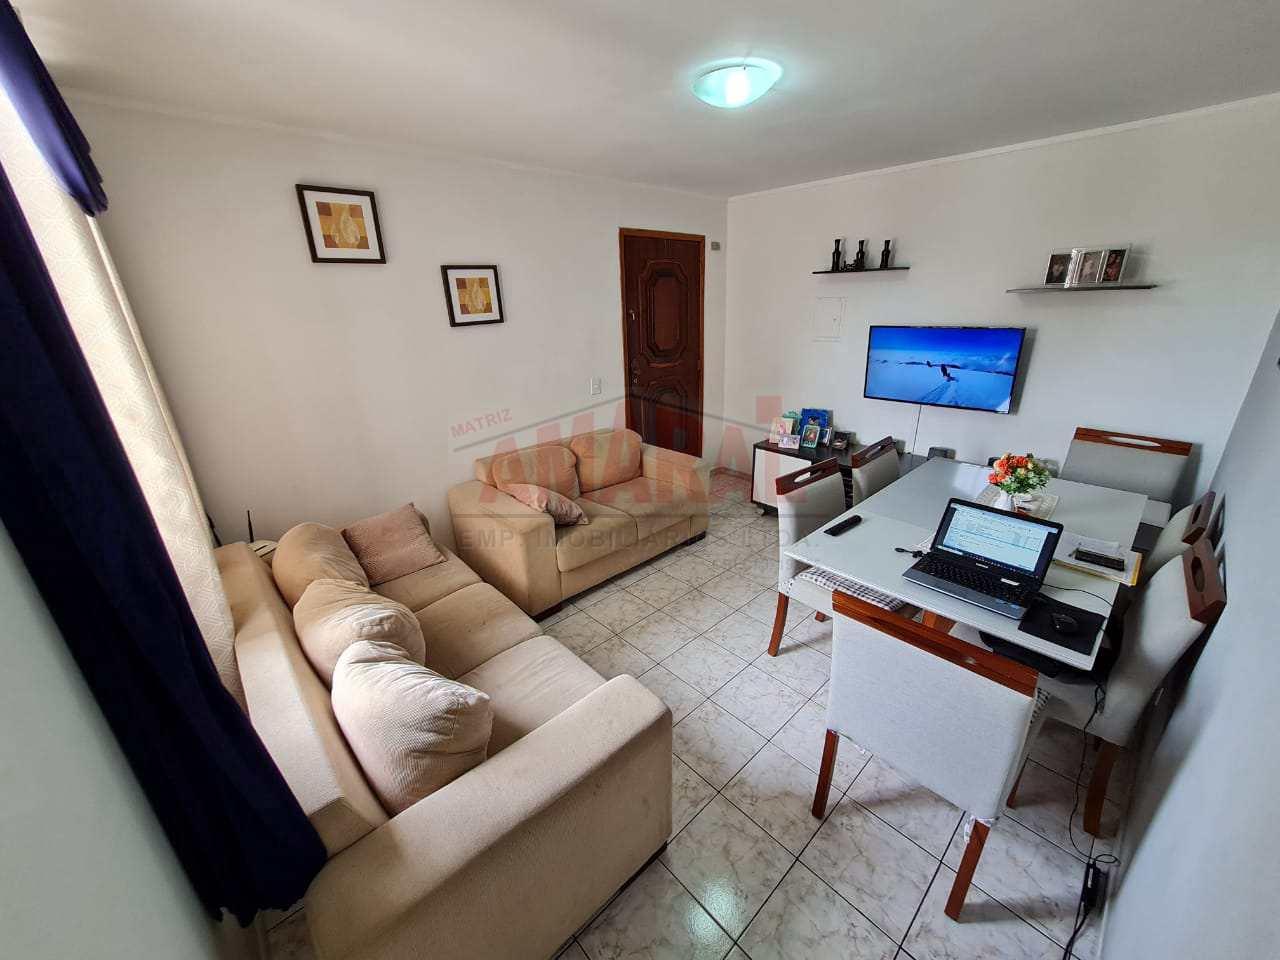 Apartamento com 2 dorms, Cidade Satélite Santa Bárbara, São Paulo - R$ 185 mil, Cod: 11355